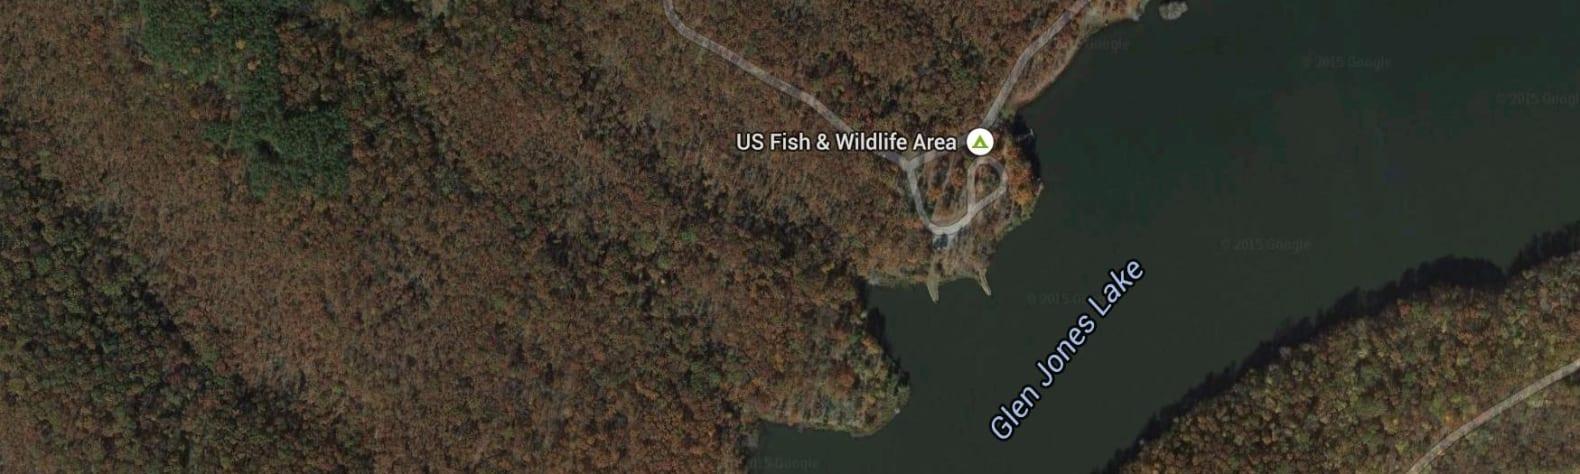 Saline County State Fish & Wildlife Area